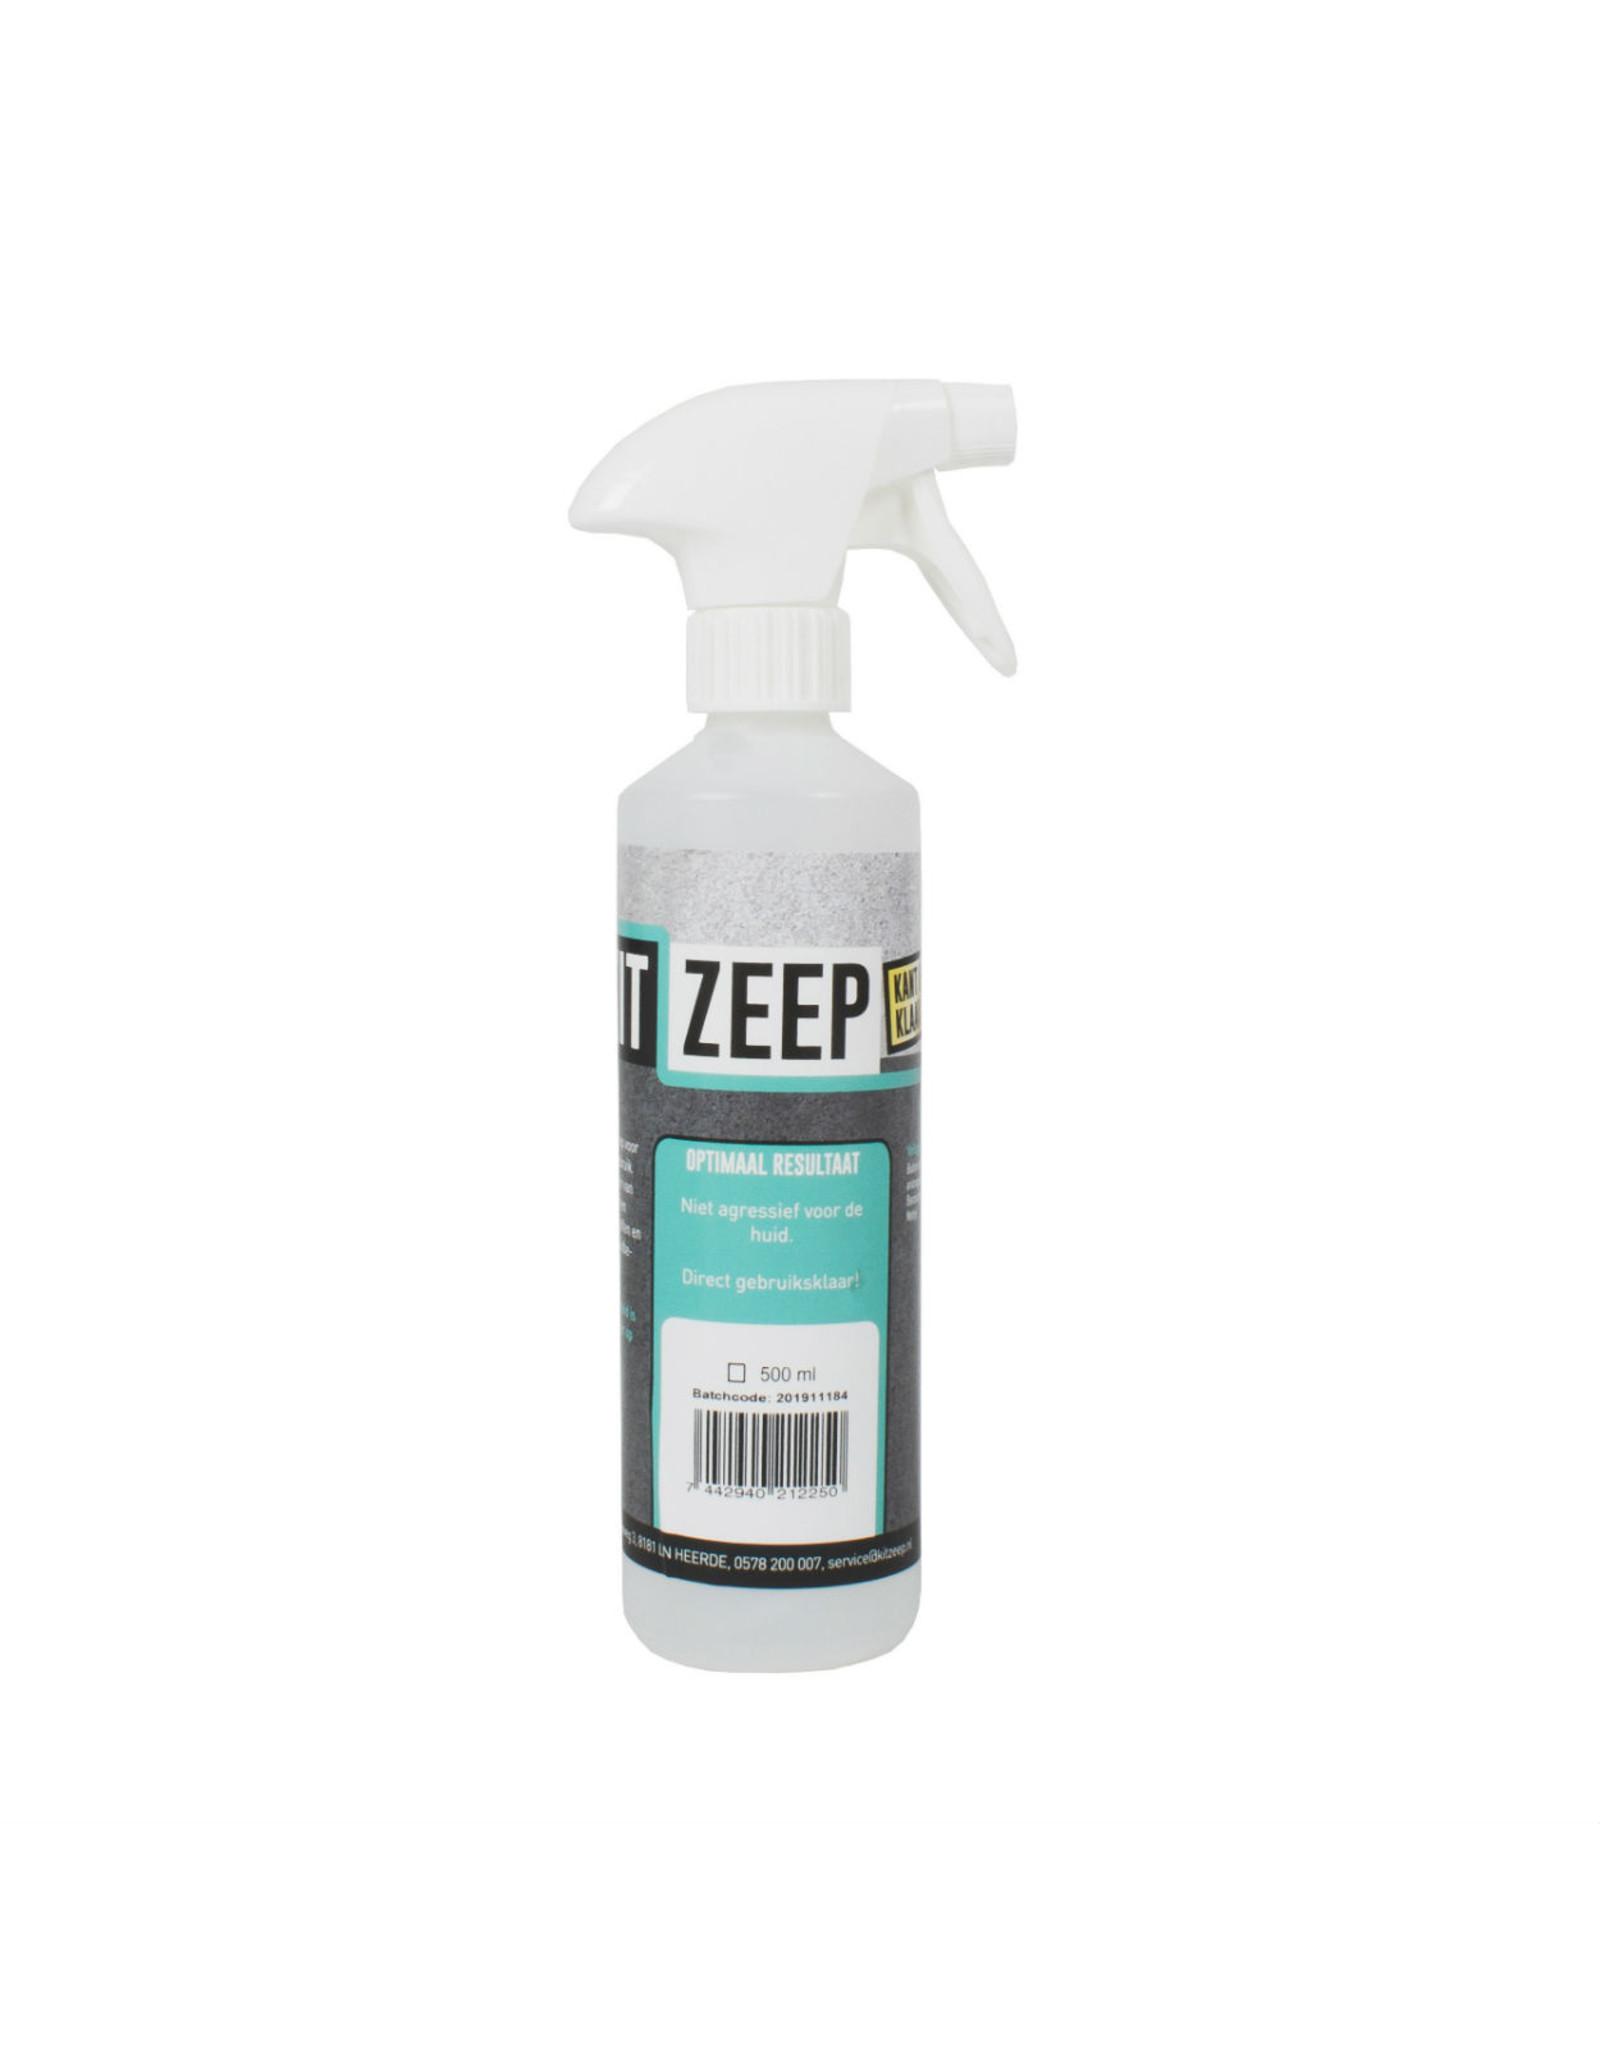 Kitzeep Kant & Klaar 500 ml sprayfles